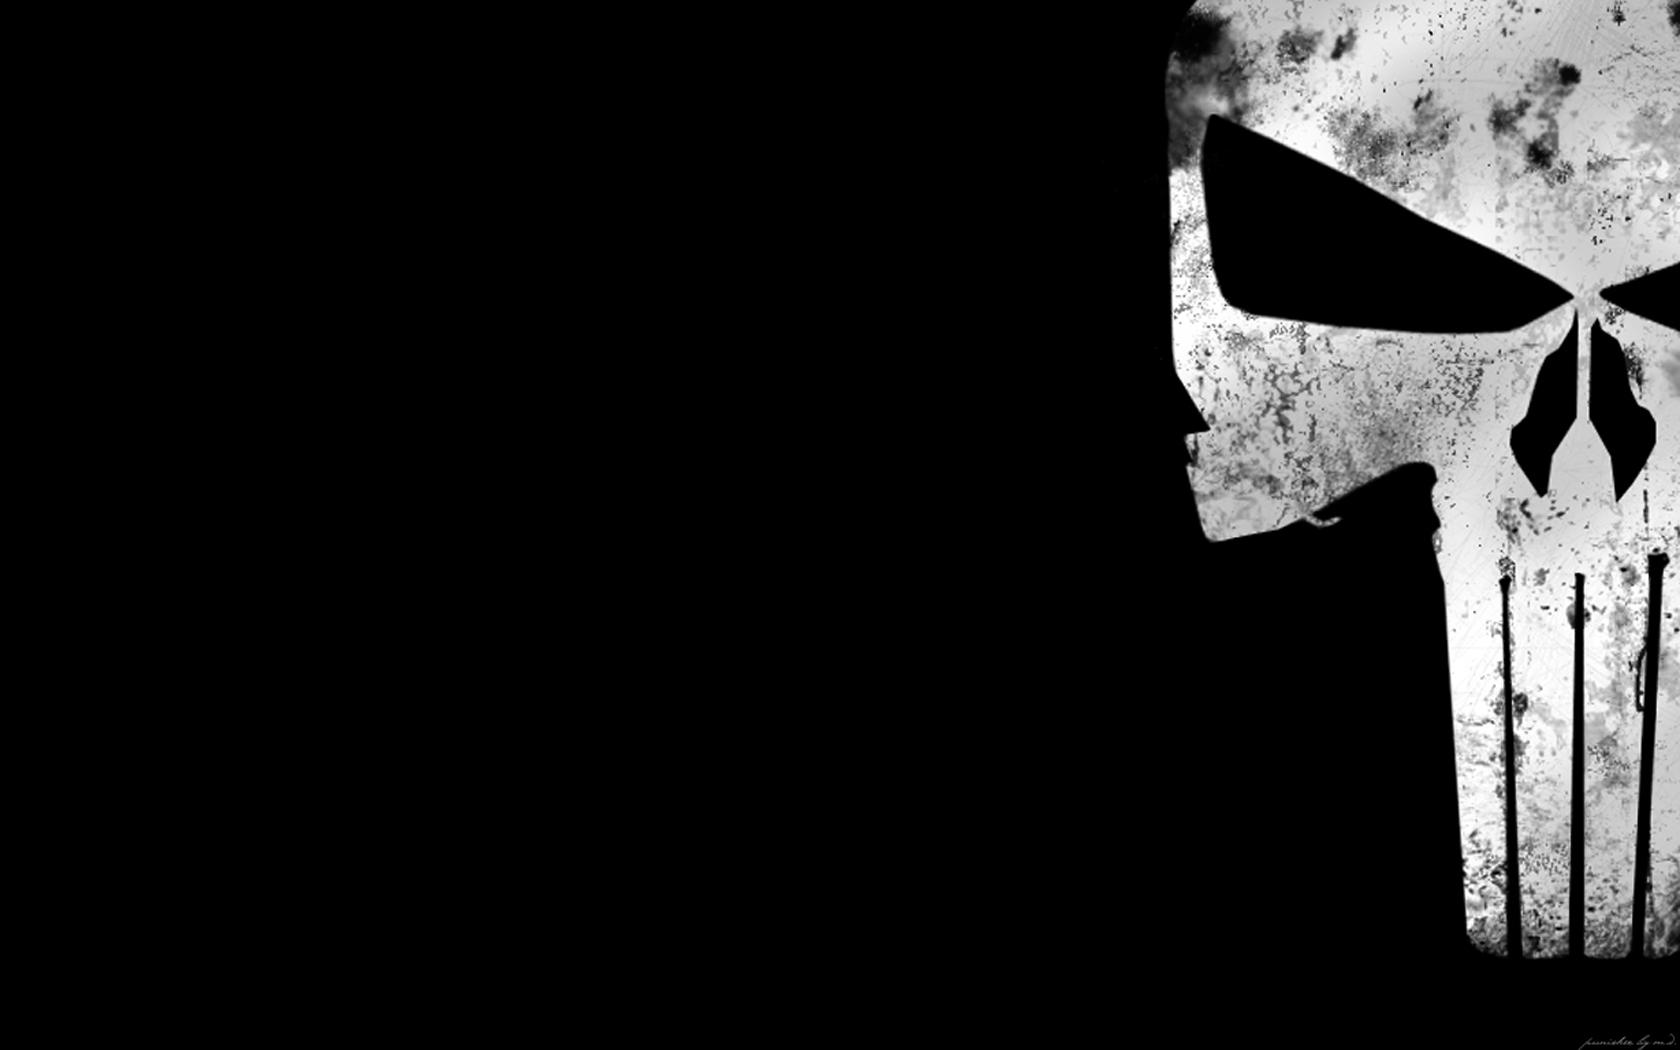 The Punisher Logo Wallpaper The punisher wallpaper